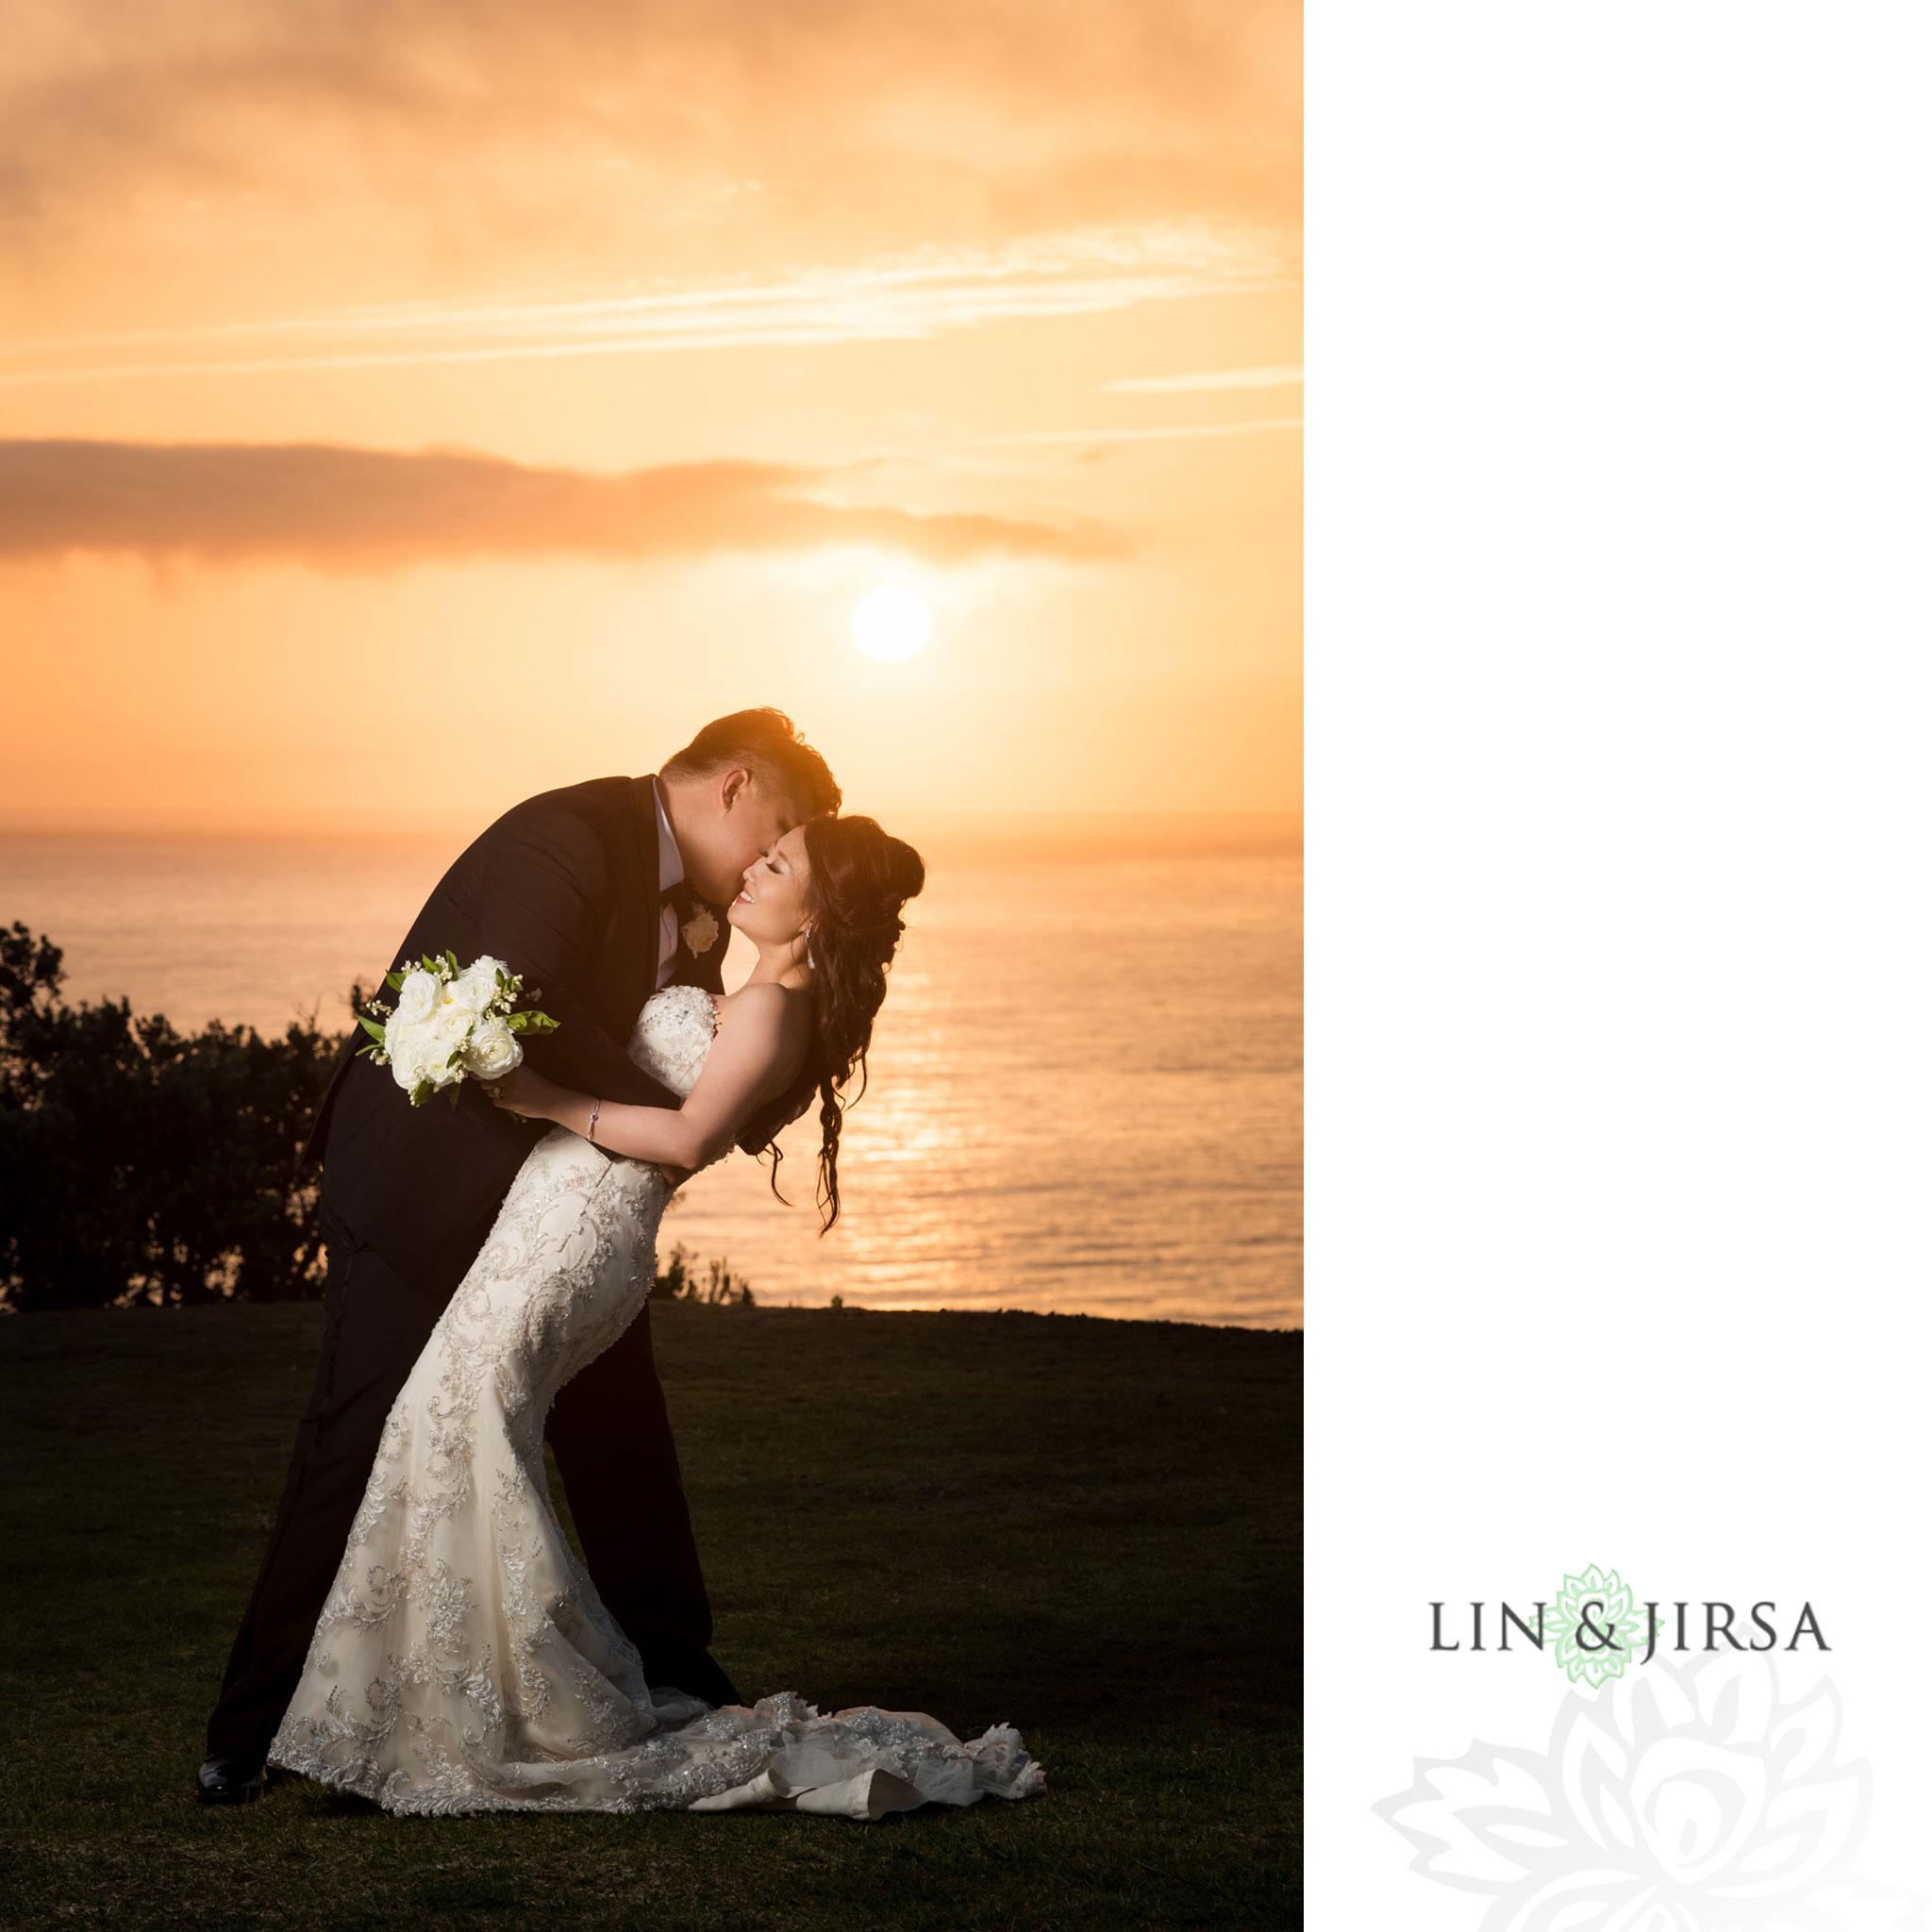 006 trump national golf club rancho palos verdes wedding reception photography